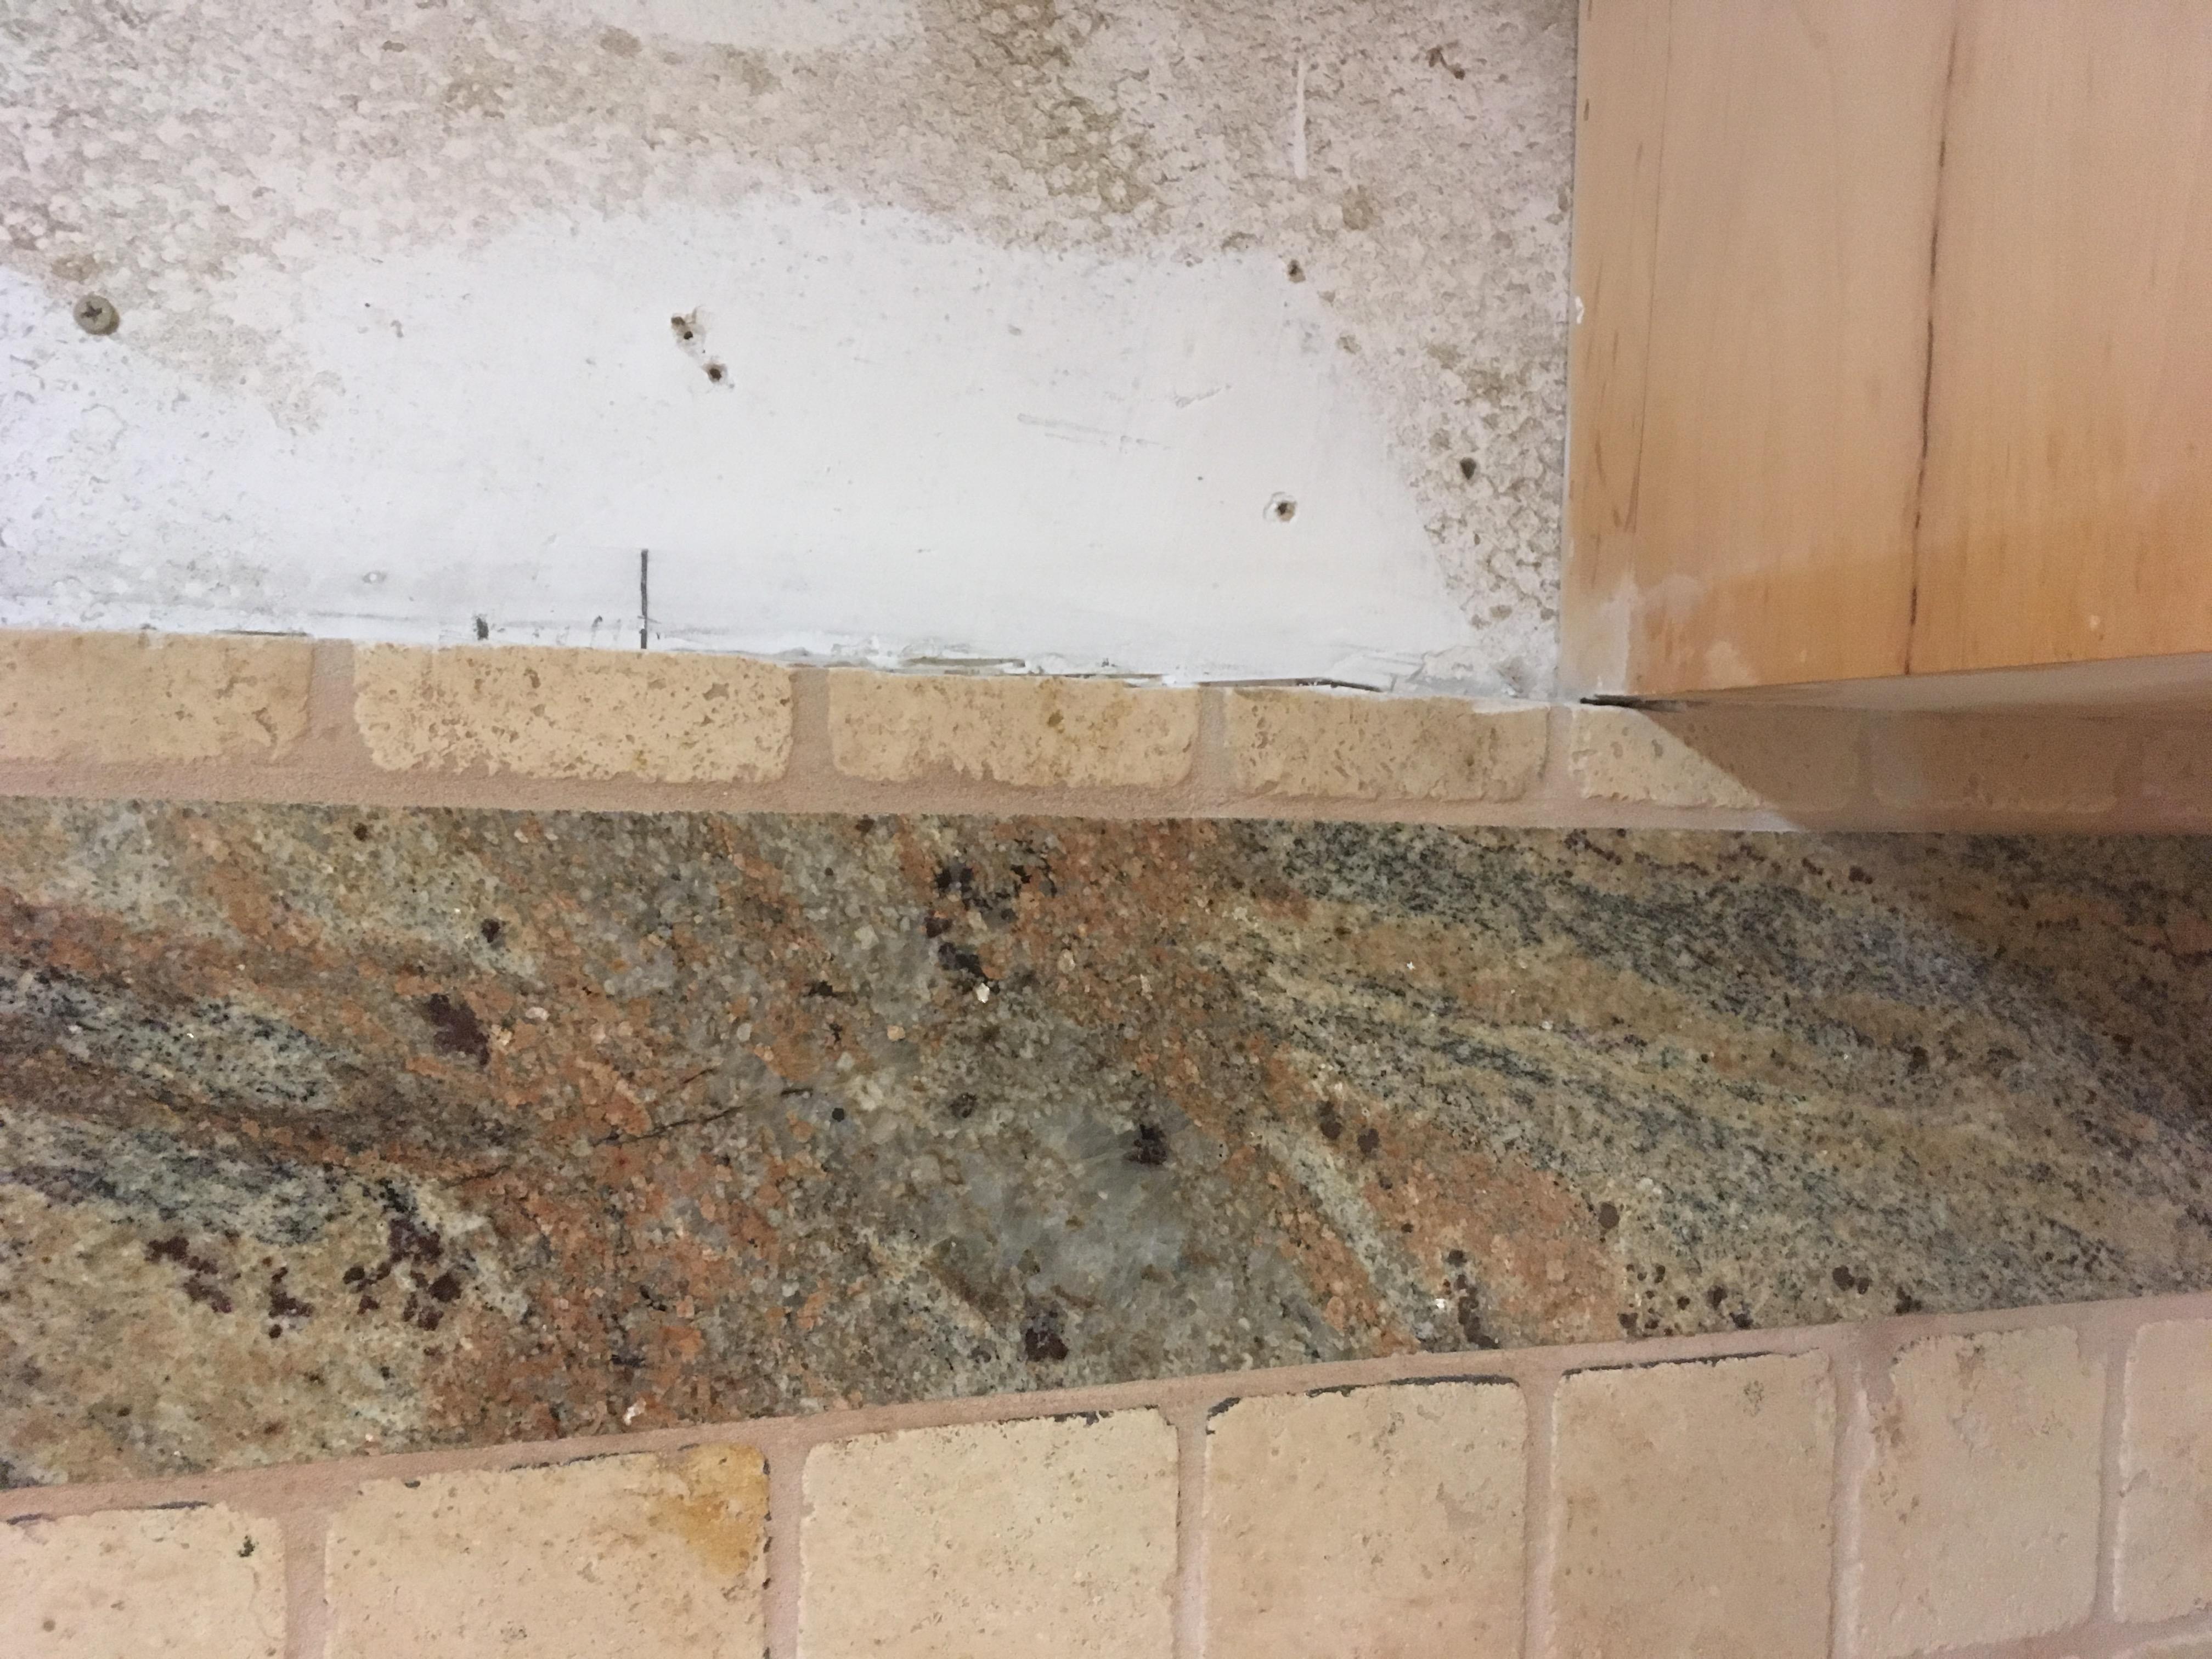 Cutting kitchen tile - use angle grinder?-img-6787.jpg